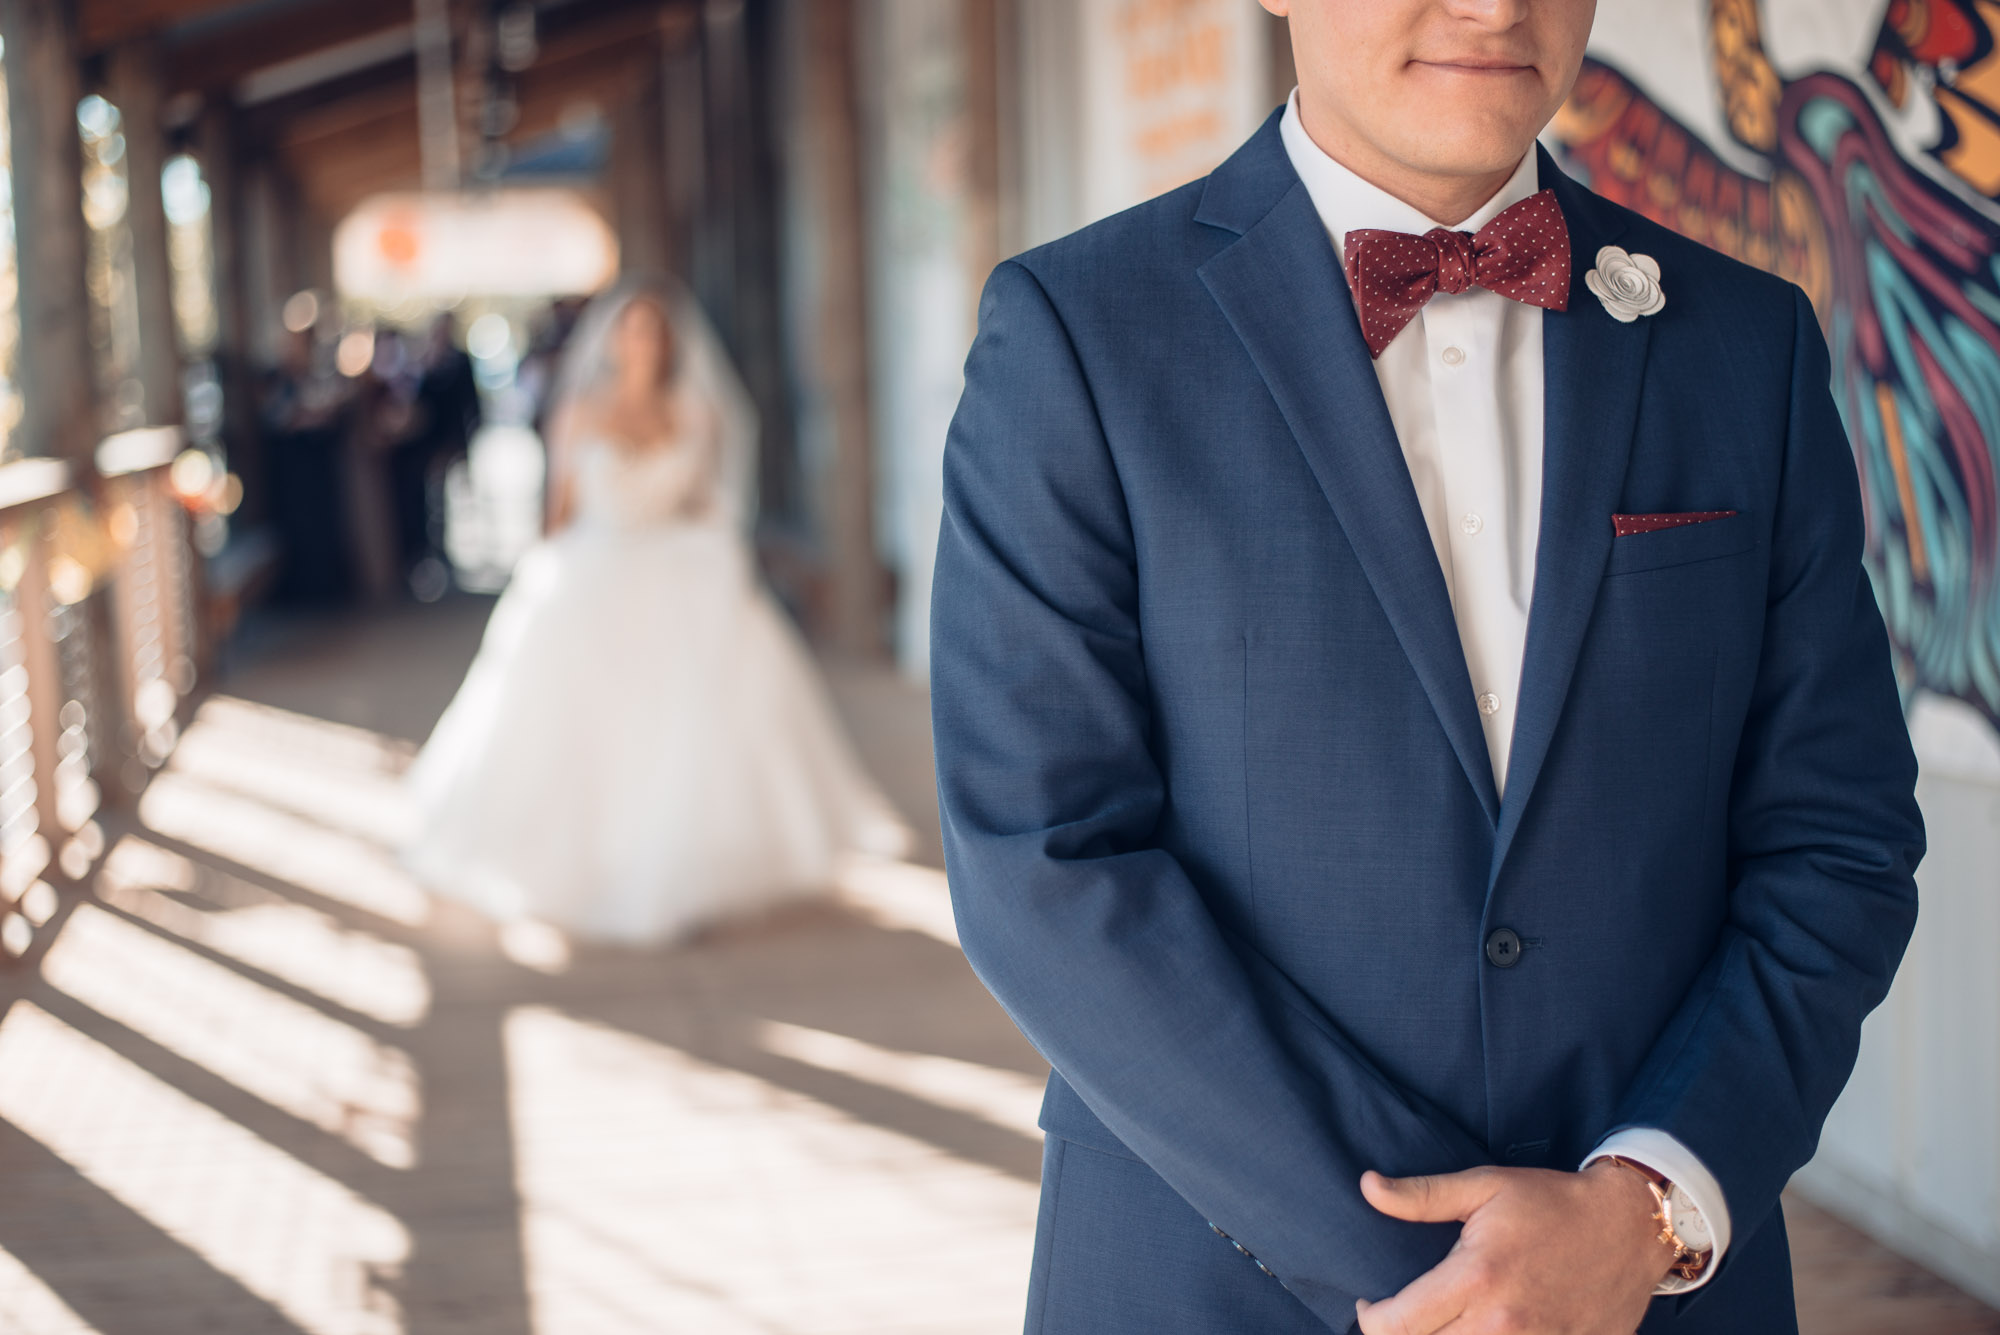 woodwinds_wedding_171020_web-21.jpg